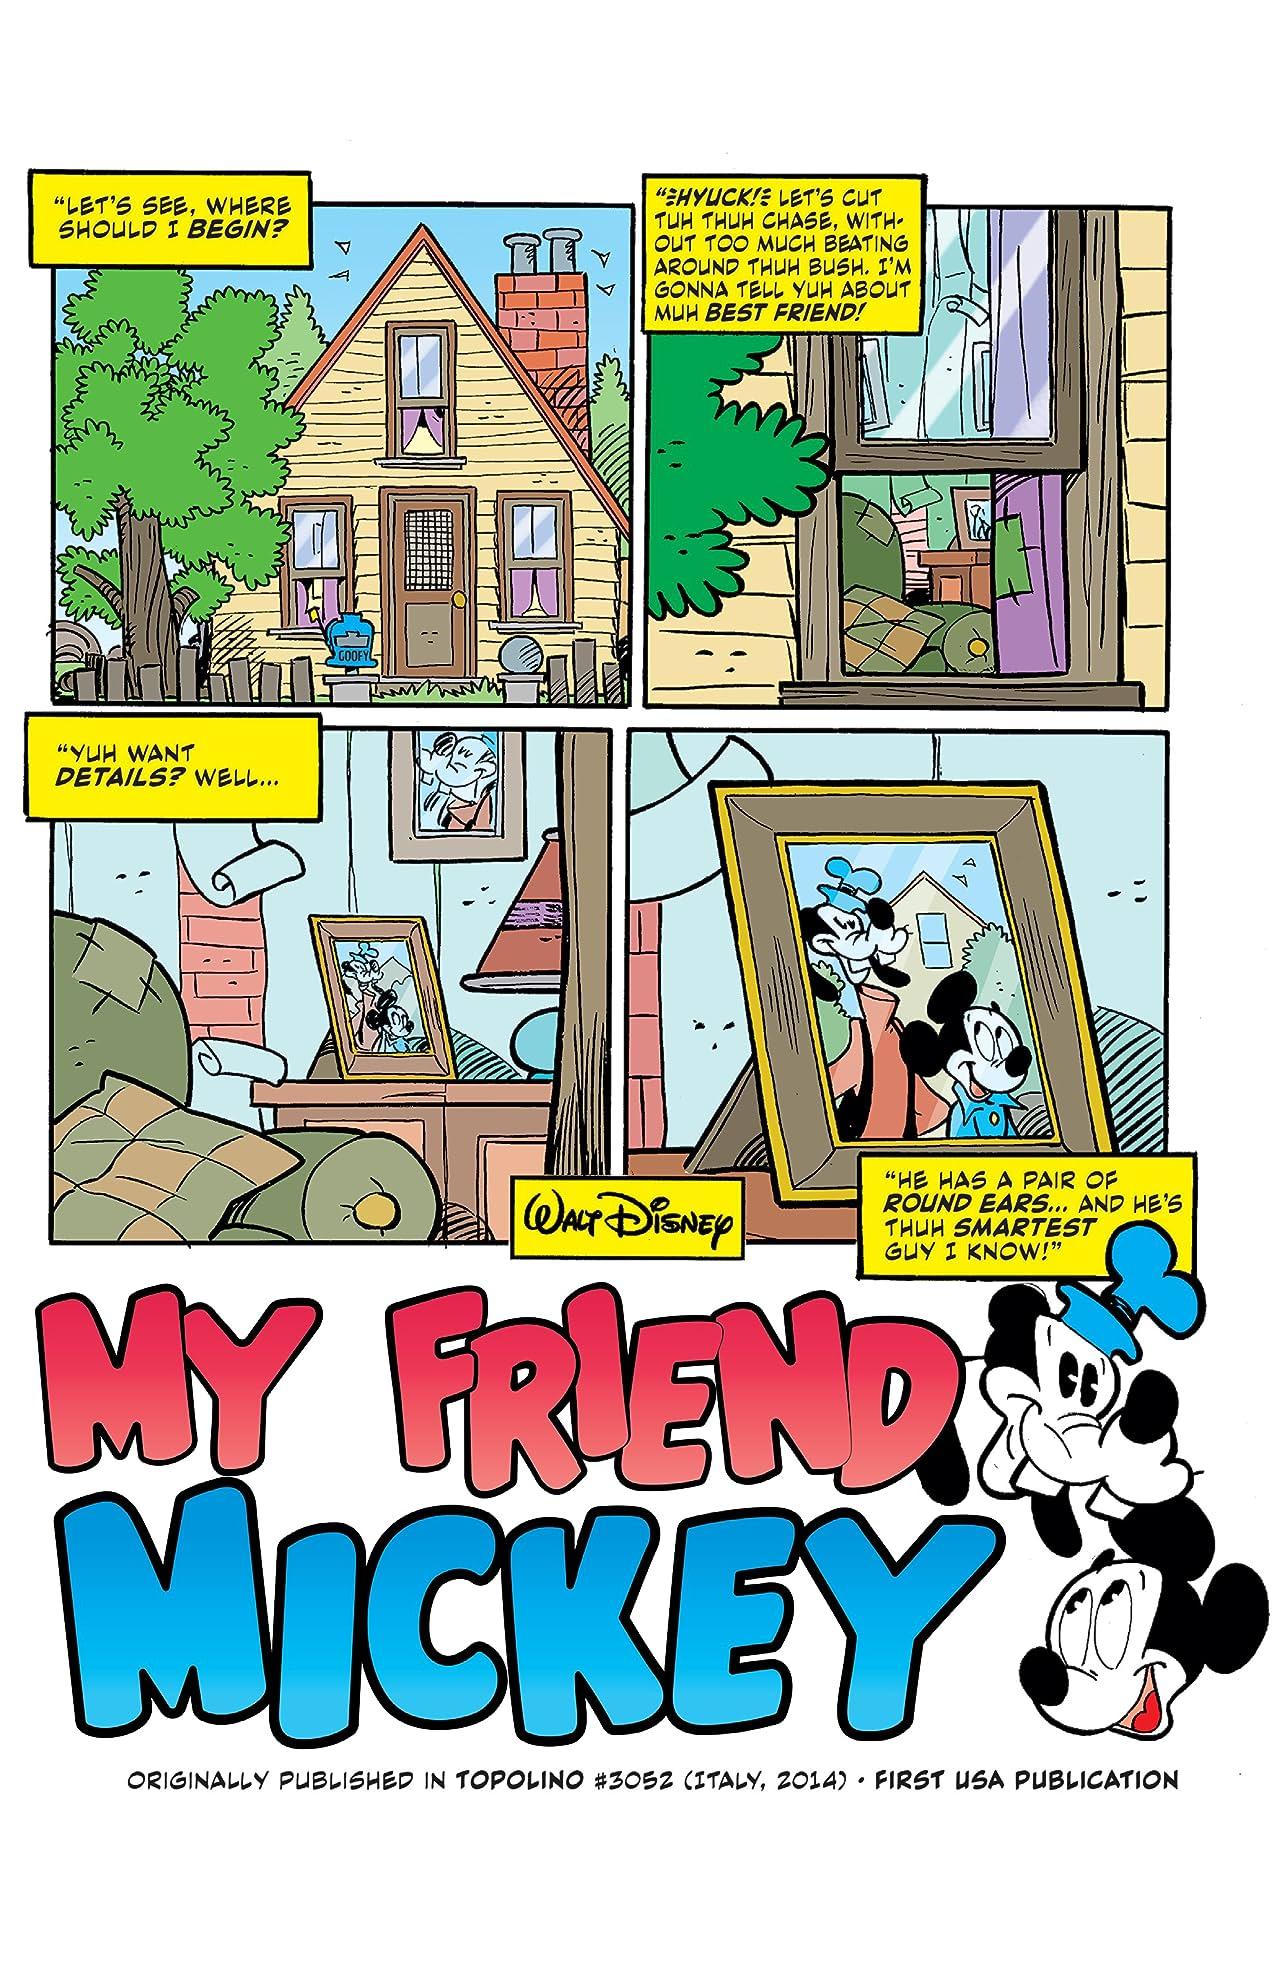 Disney Comics and Stories #1